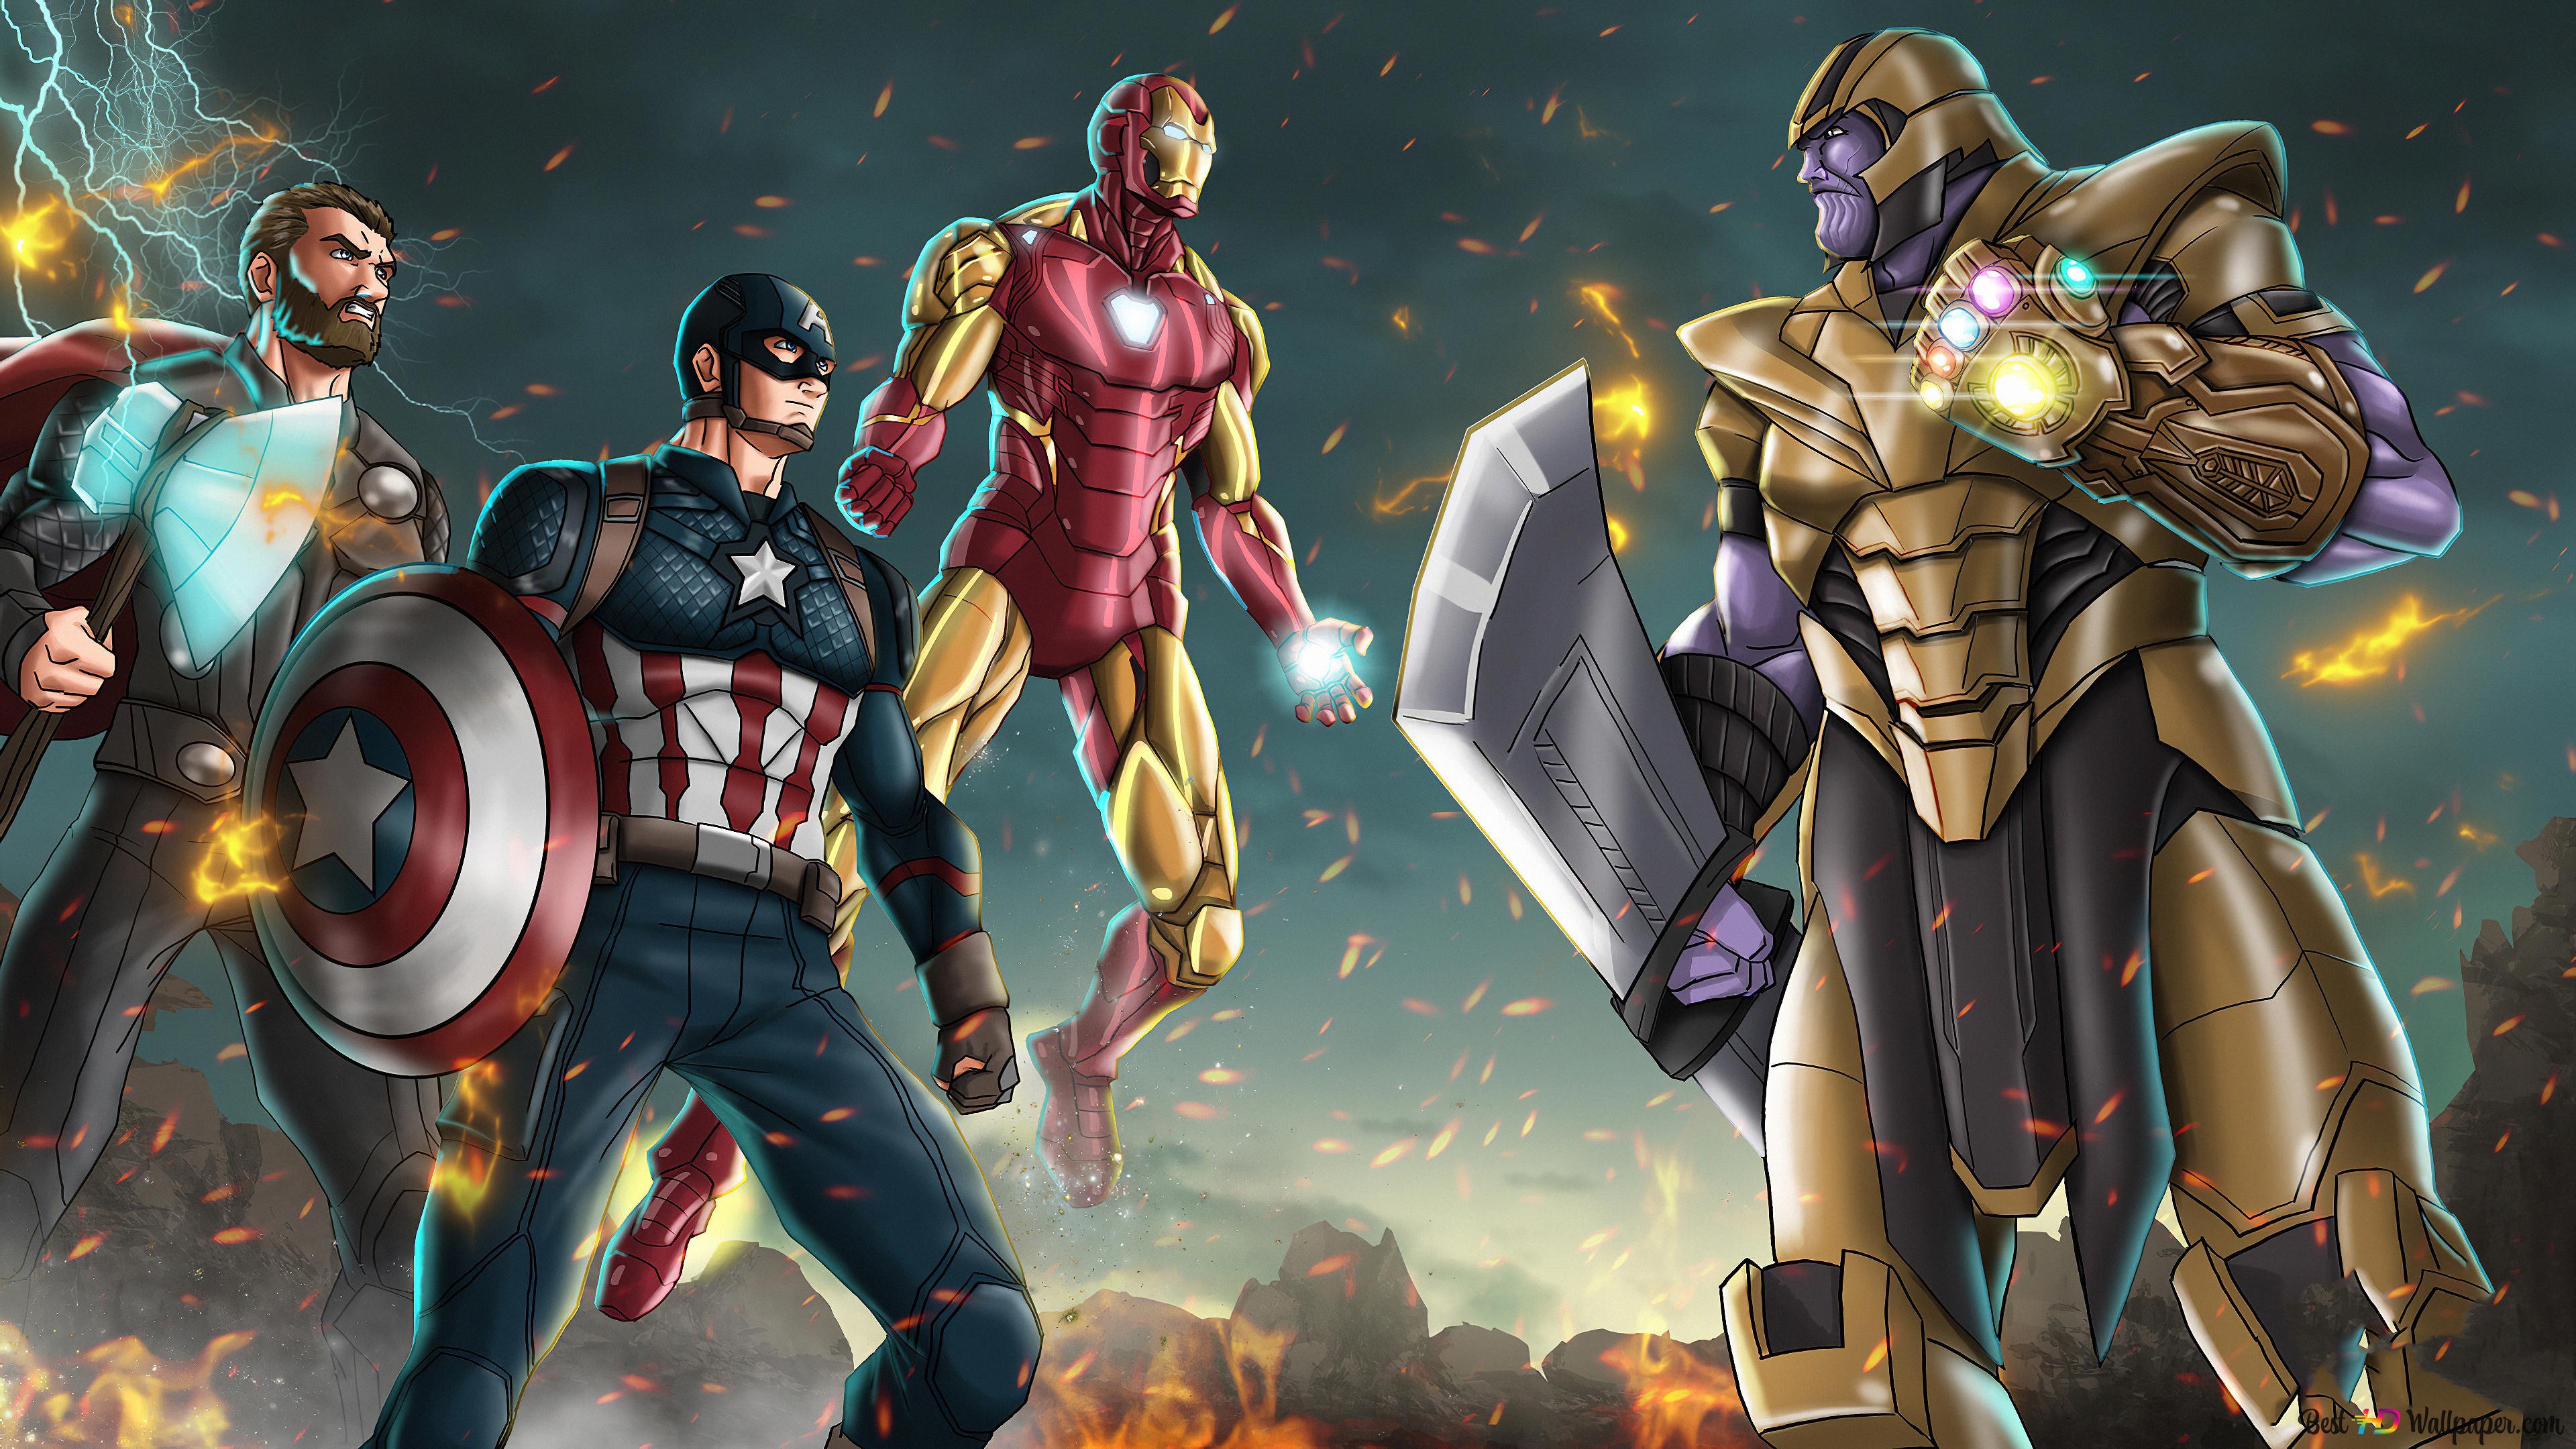 Avengers Endgame Final Battle Hd Wallpaper Download